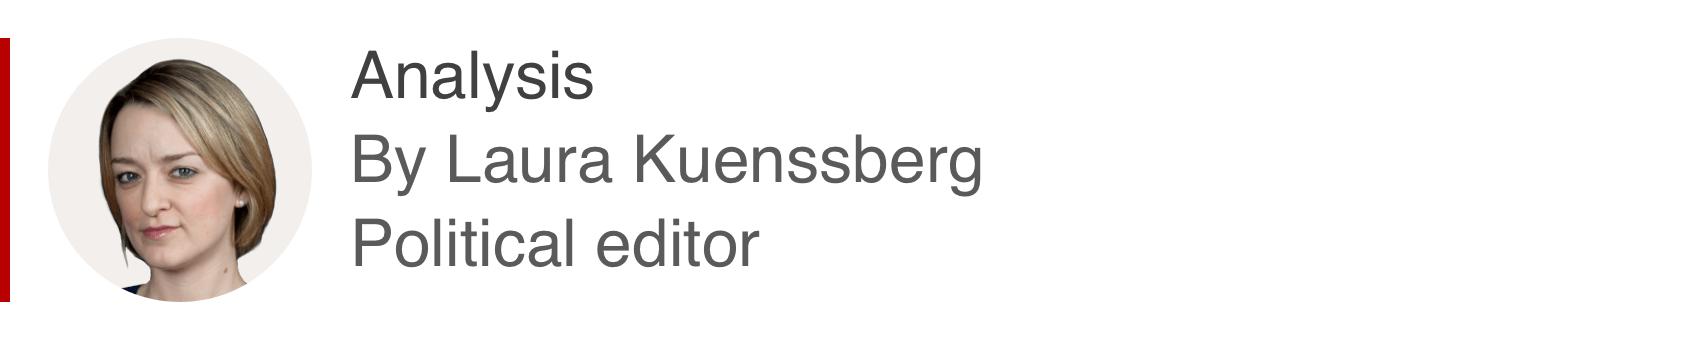 Caixa de análise de Laura Kuenssberg, editora política